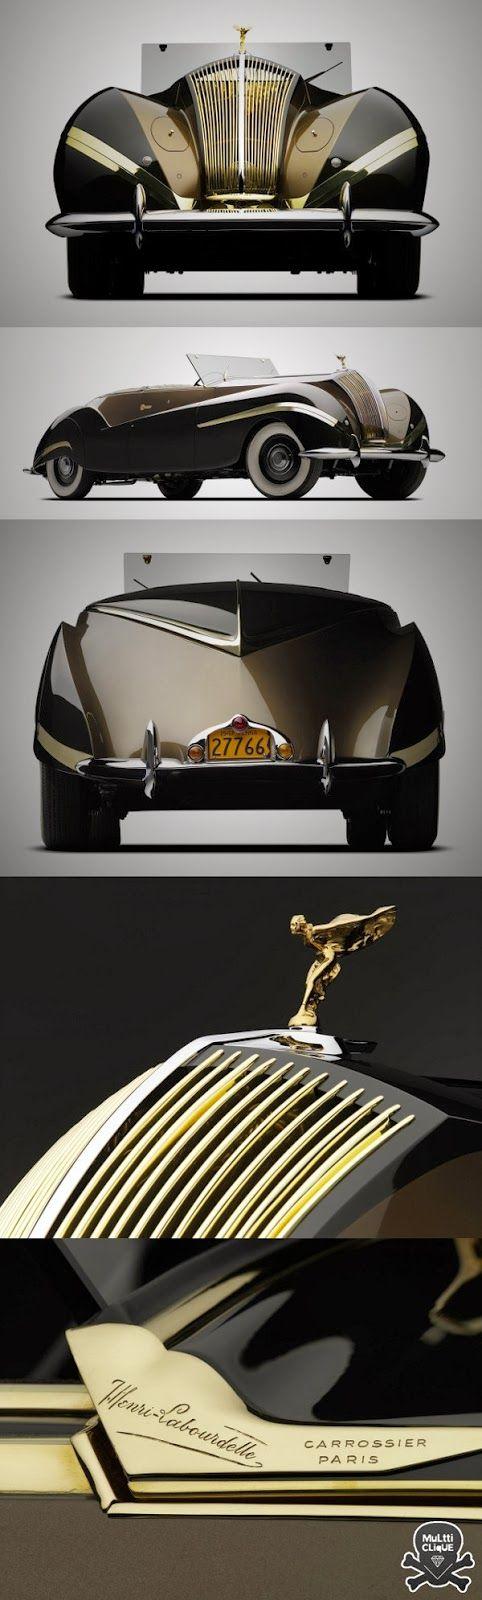 Conoce el Rolls-Royce Phantom III Cabriolet 1939. CL - i.m.o better looking than any current model.